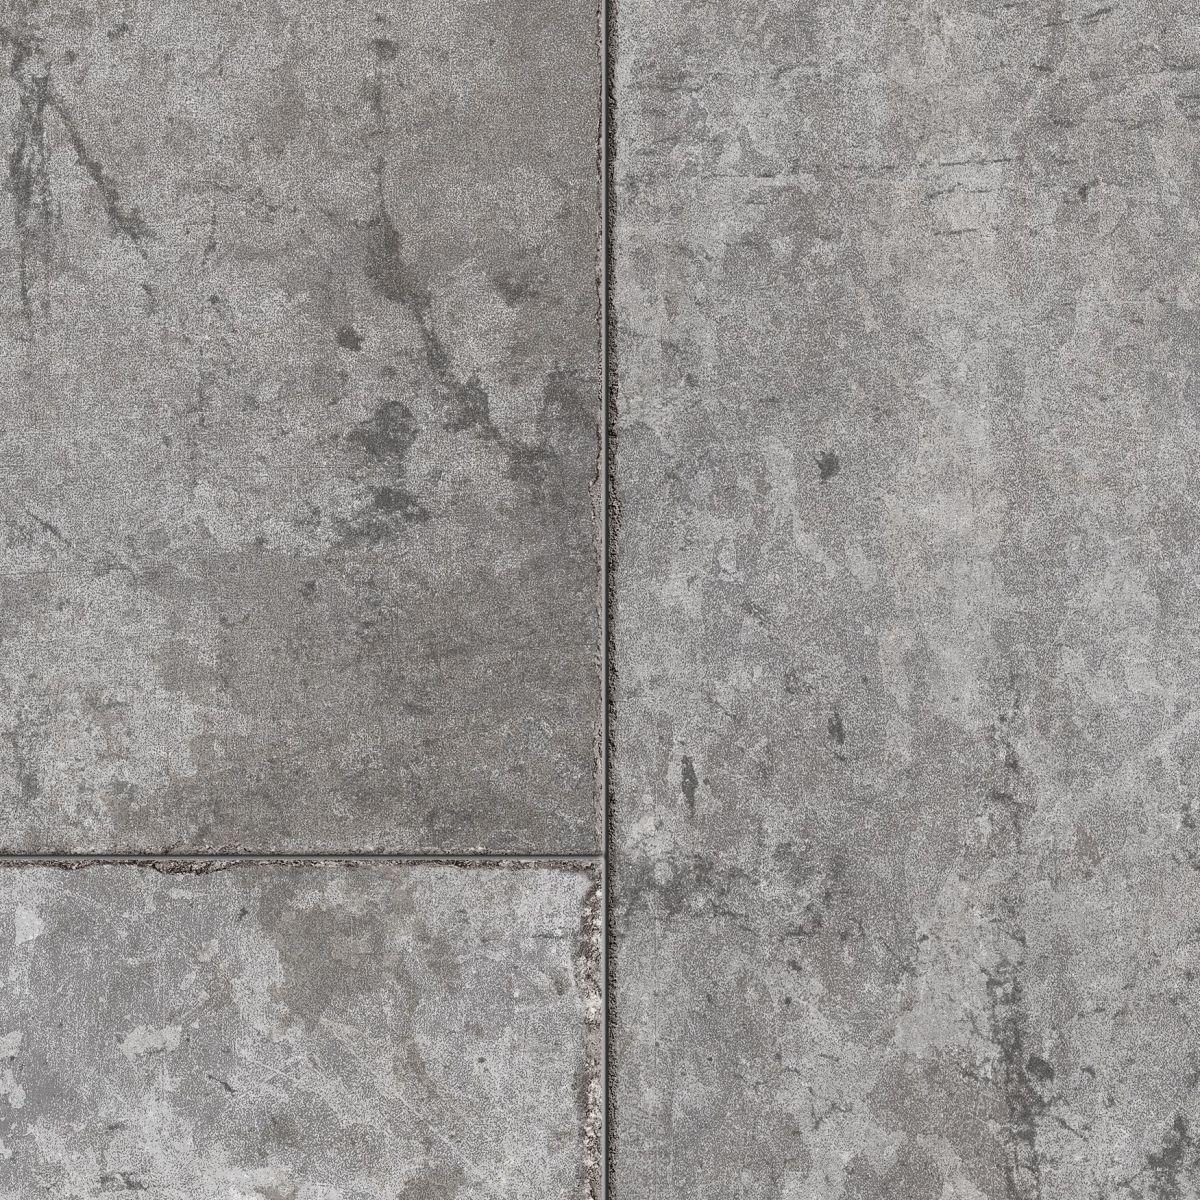 Avatara vloeren steen O7 detail